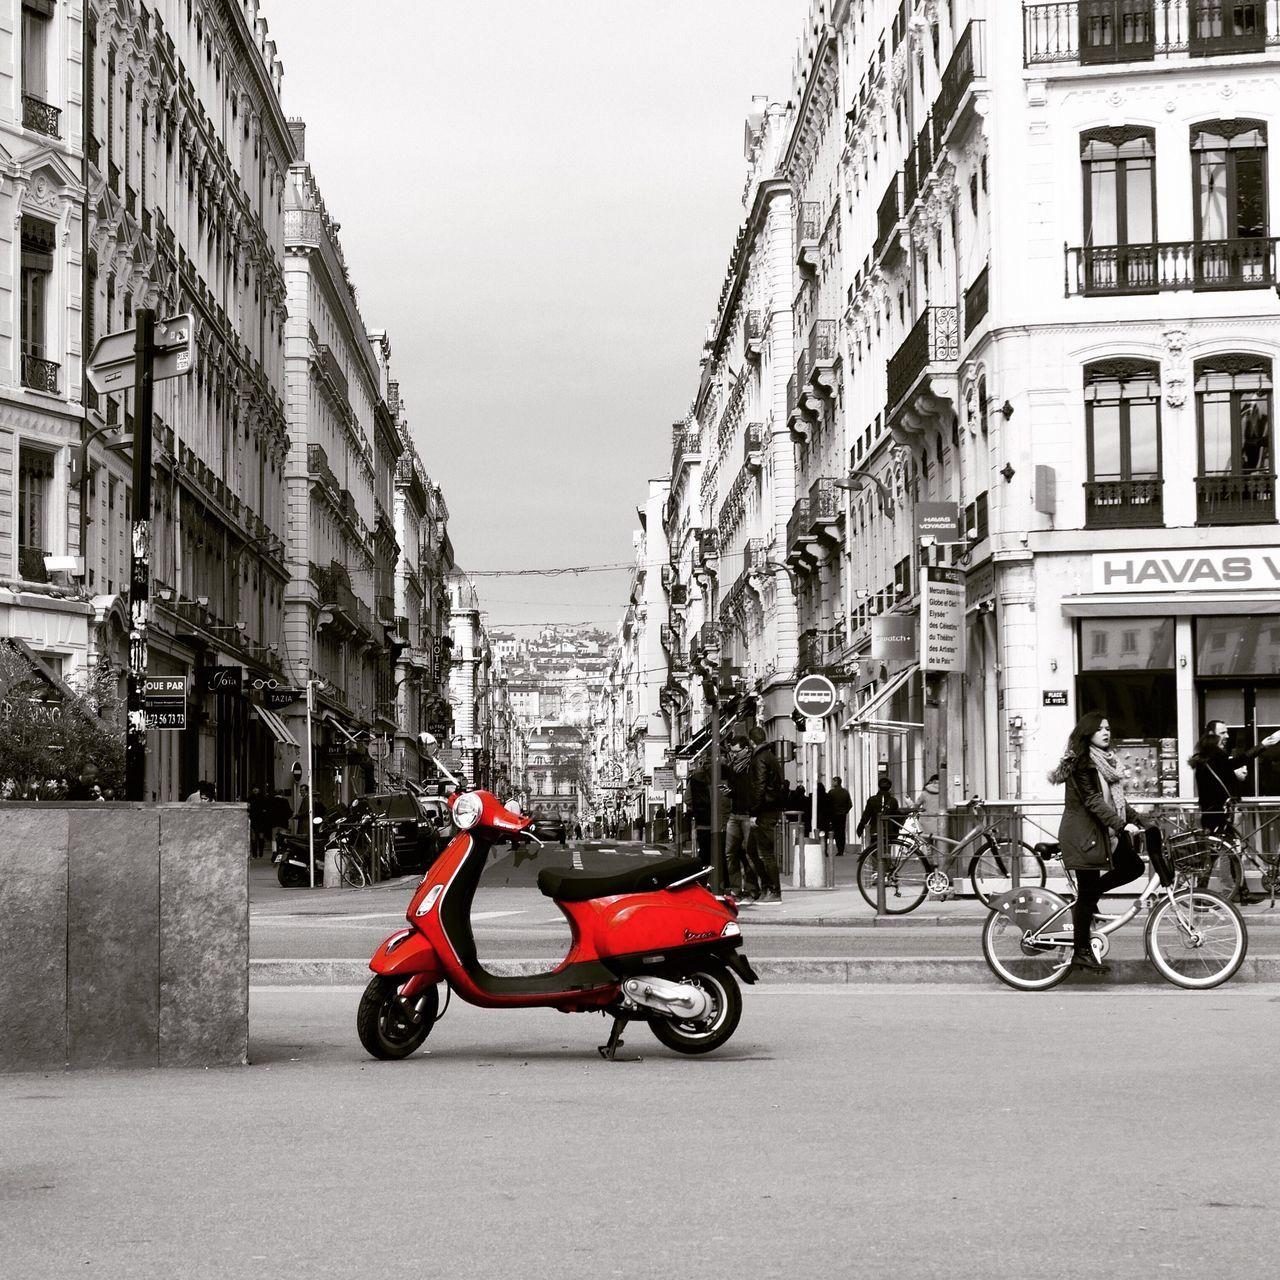 Afternoon drive Onlylyon Streetlife Redspot Eyecatcher Streetsoflyon Driveme Lonely Objects Redandgrey Lyonbellecourt